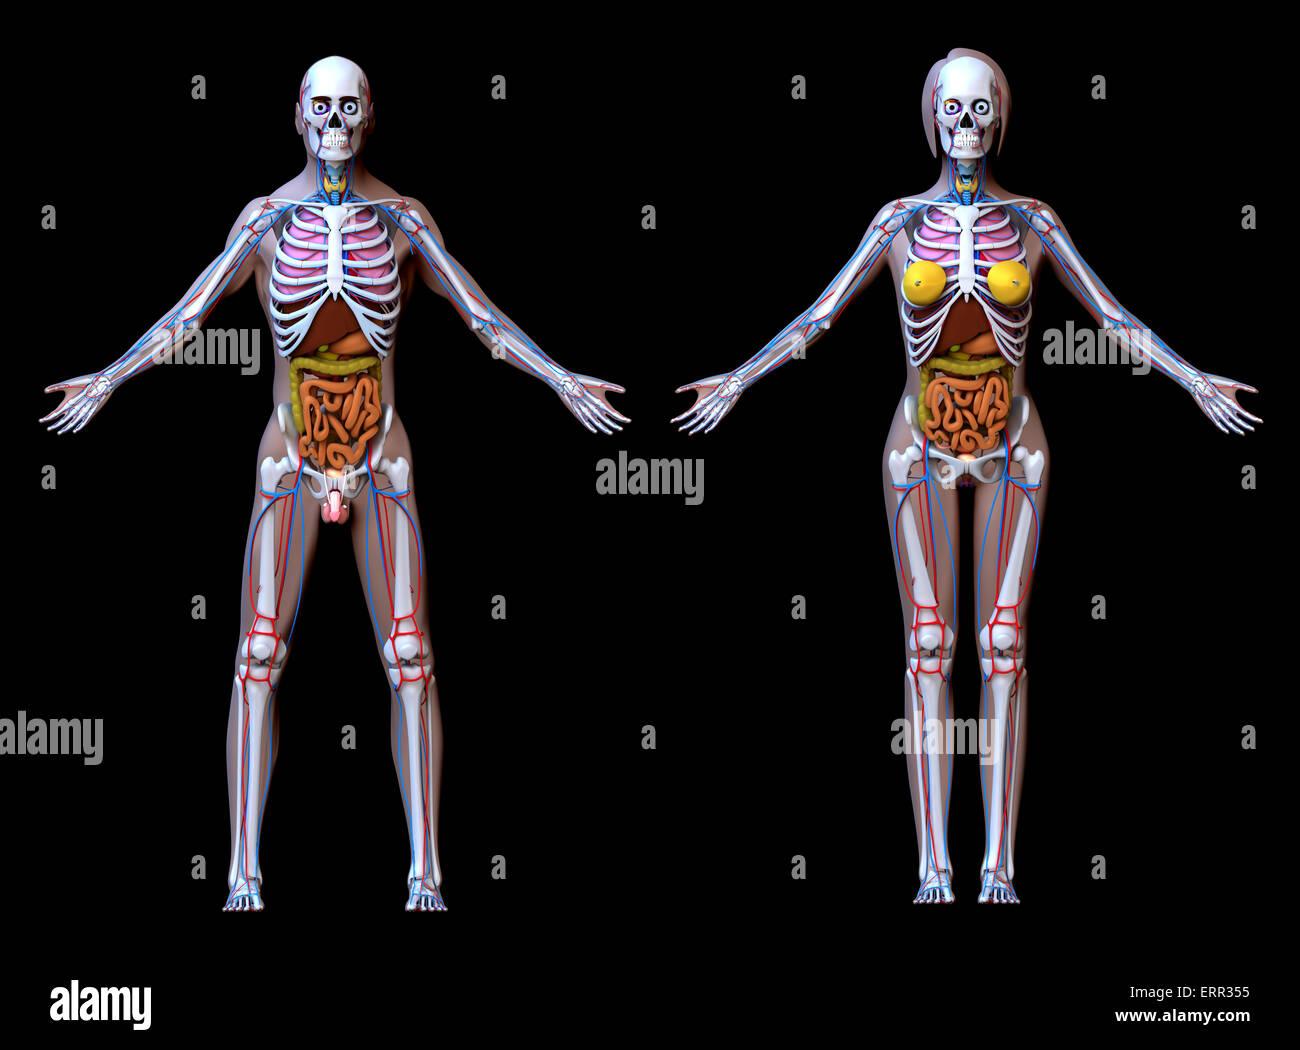 Muscular System Stockfotos & Muscular System Bilder - Alamy